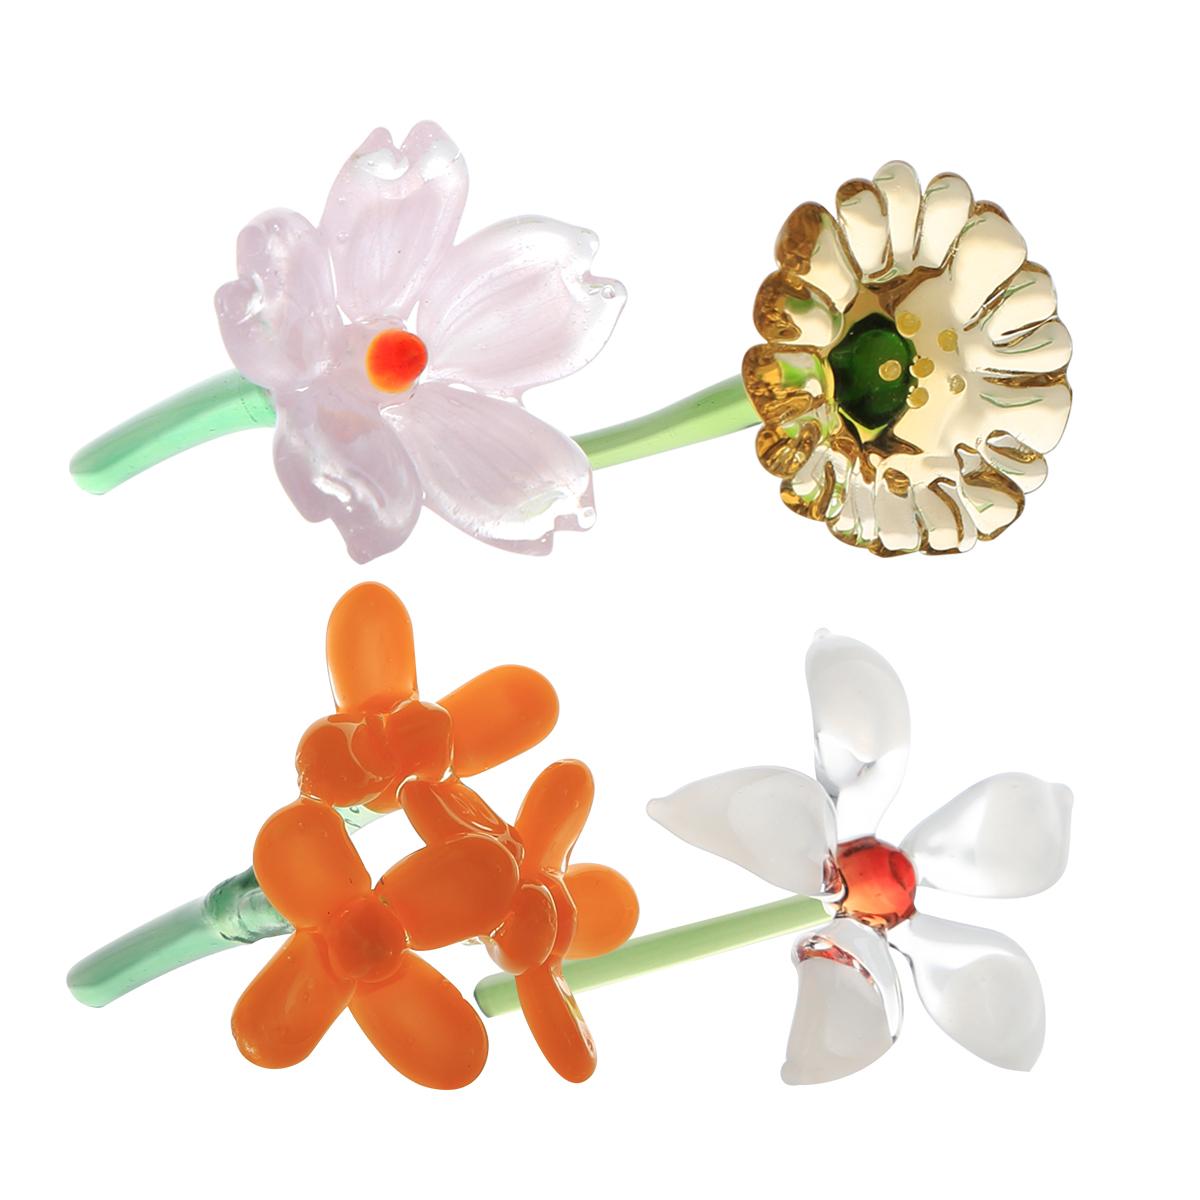 四季の花 (付属品)